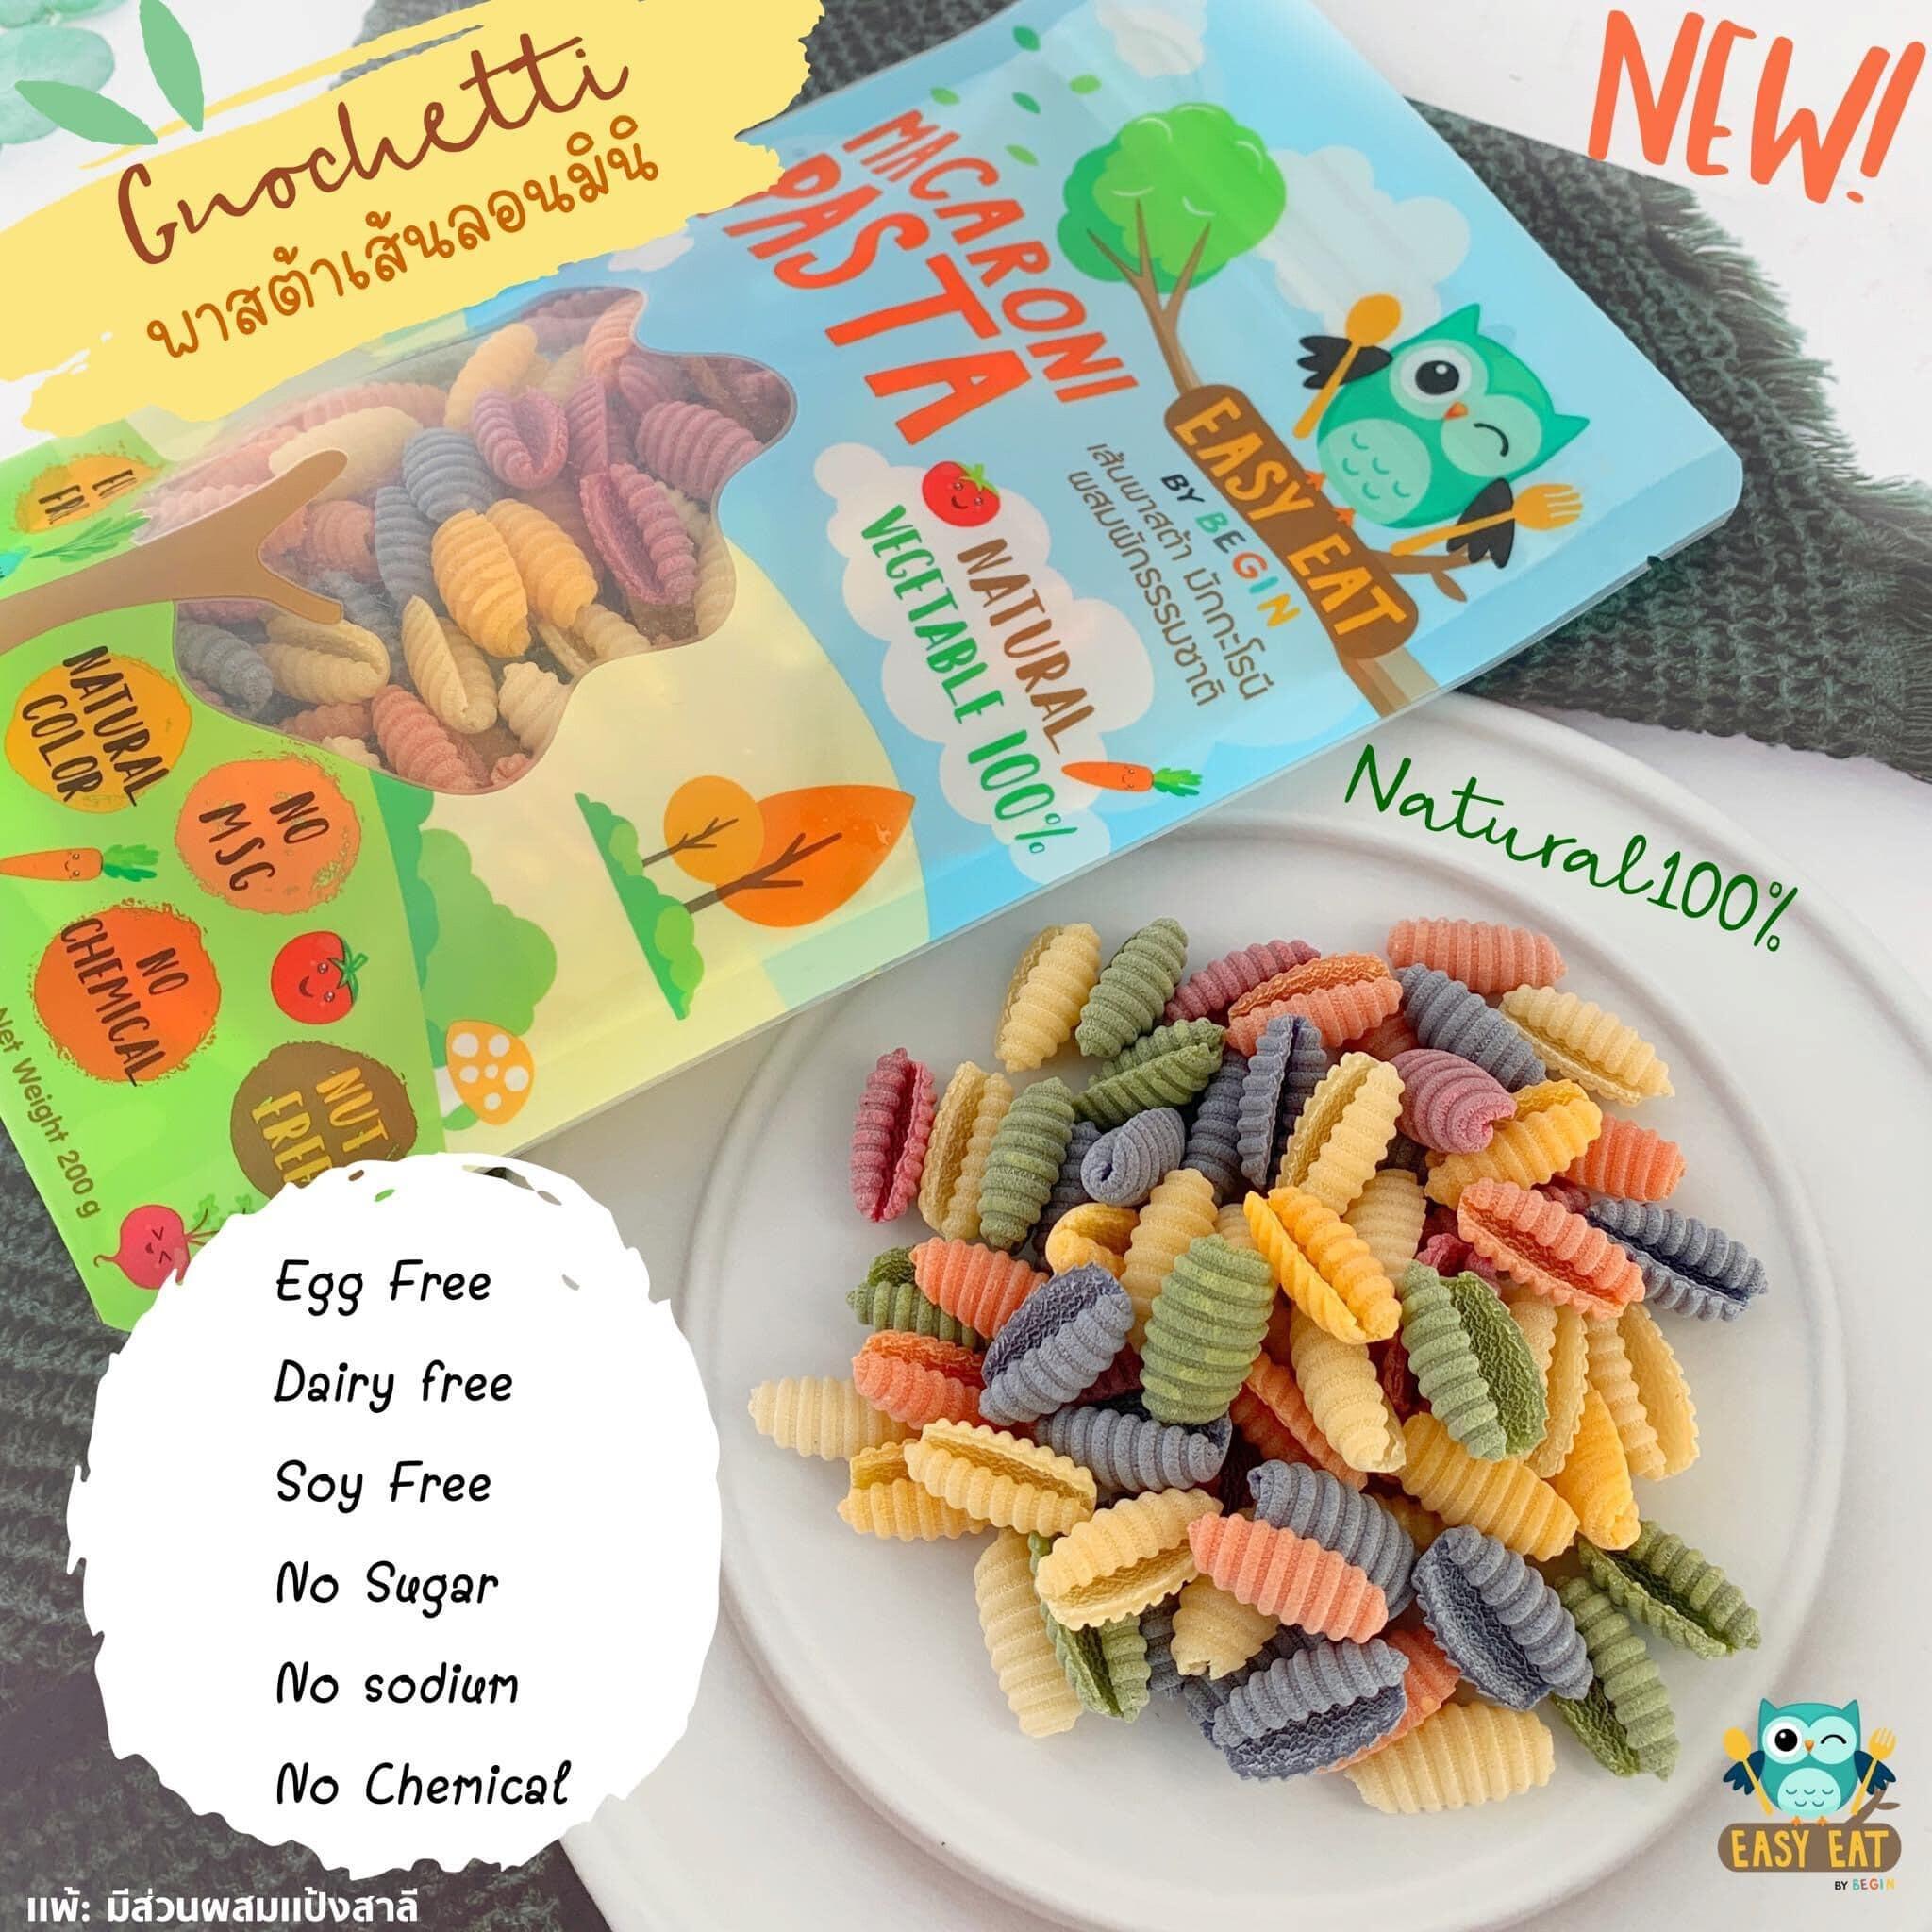 Begin Baby Food เส้นผัก เส้นลอนมินิ(gnocchi) มักกะโรนีผสมผักธรรมชาติ 100% สำหรับเด็กเริ่มหัดทาน อาหารสำหรับเด็ก พาสต้า Noodle *มีแป้งสาลี.